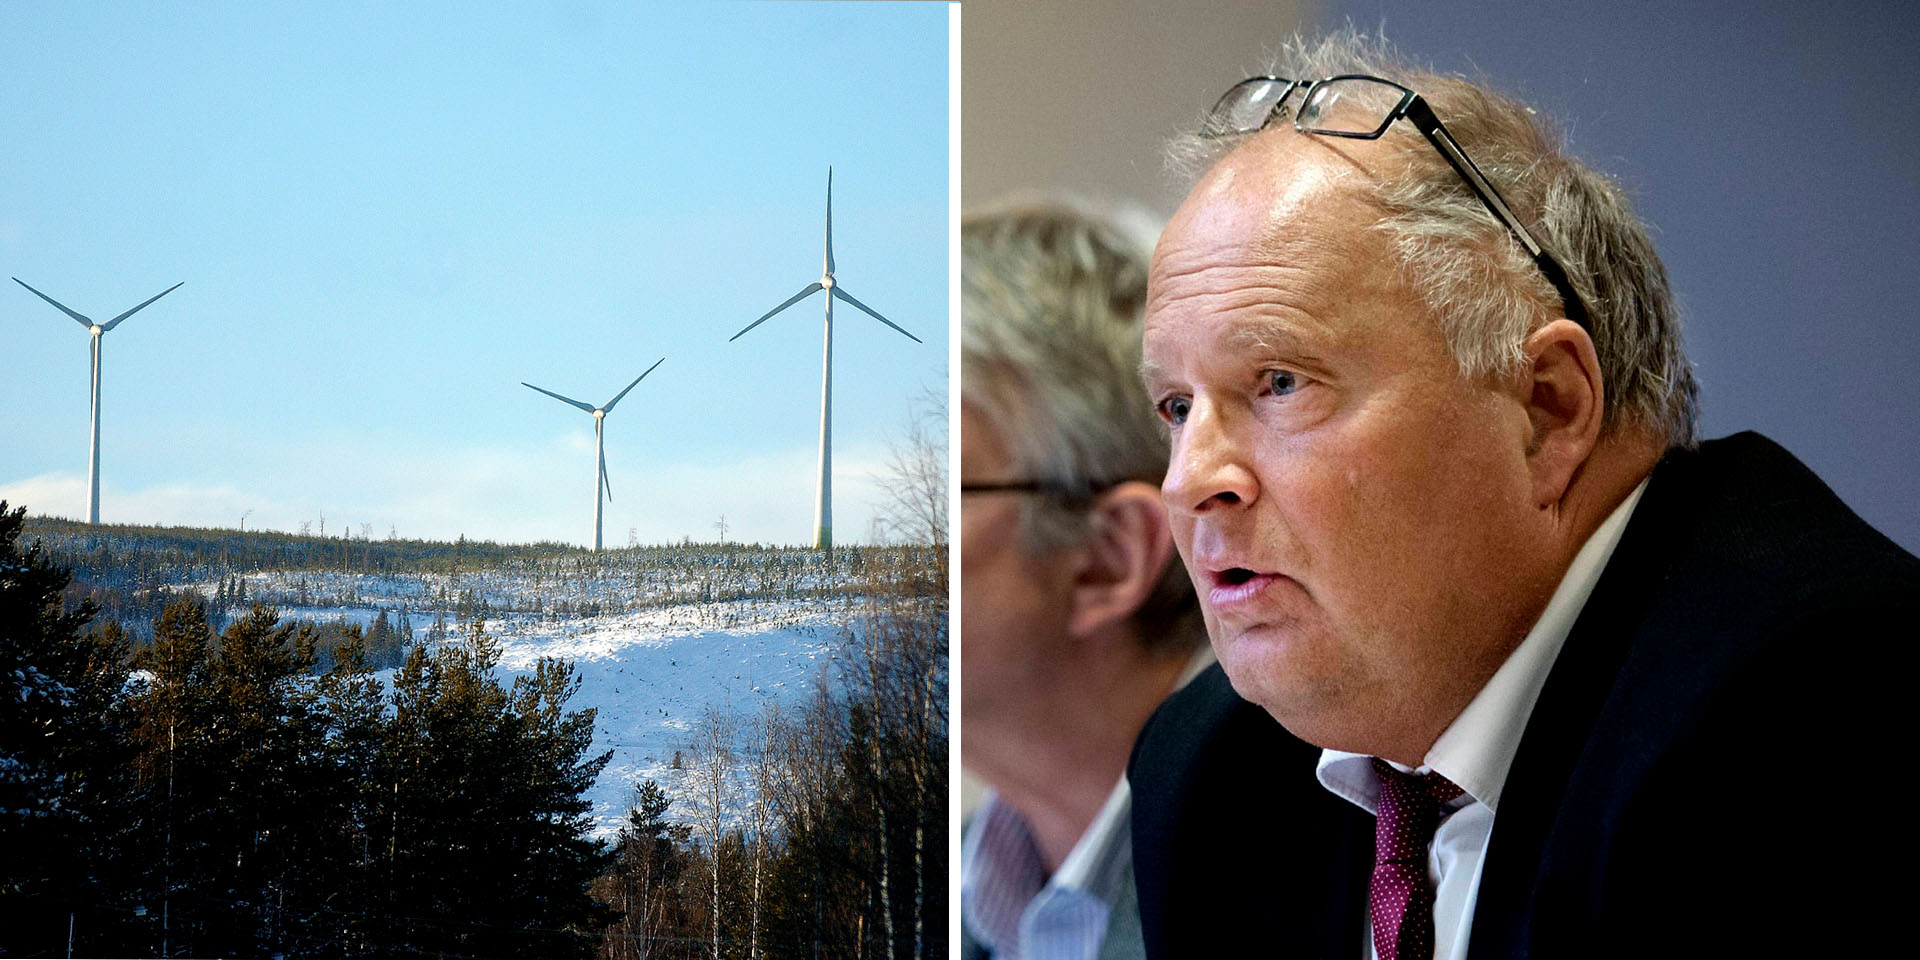 Sverige drar tillbaka em ansokan